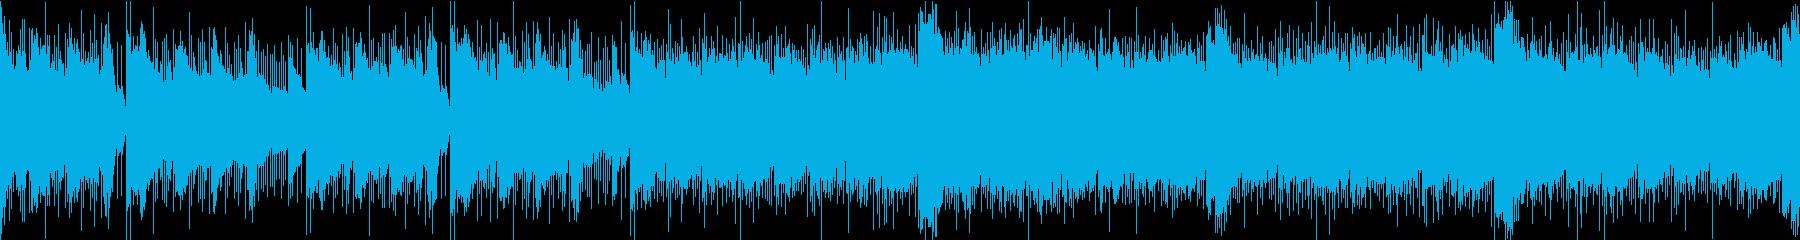 RPGの一般バトルミュージックの再生済みの波形